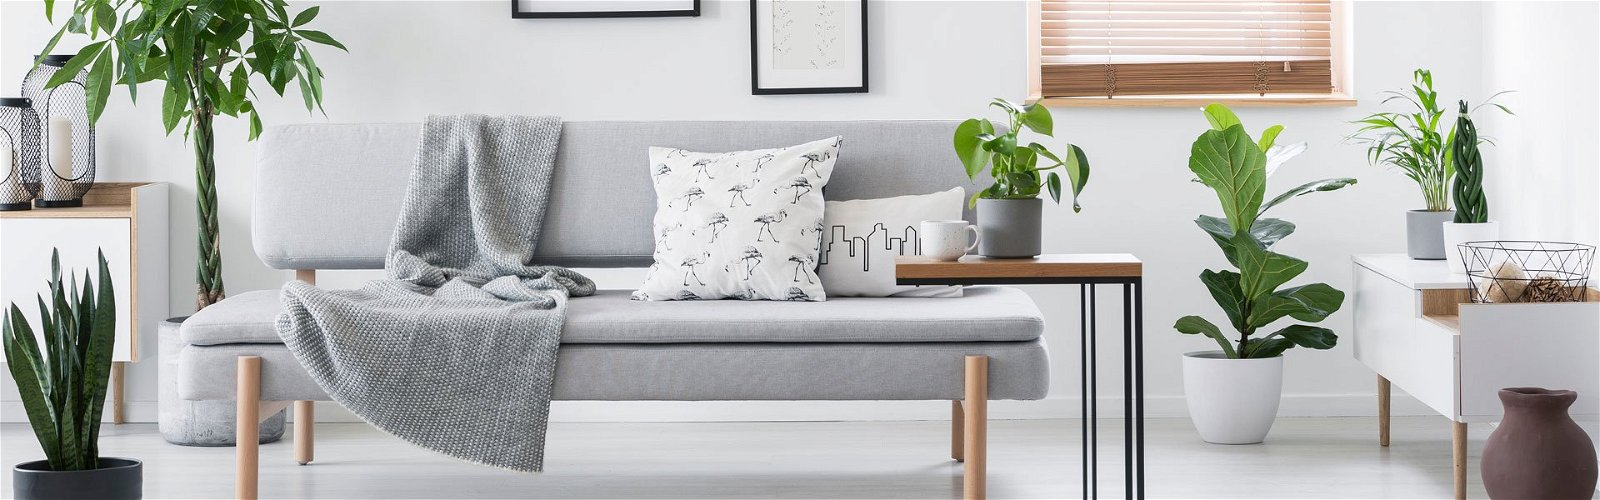 Stue med mange stueplanter